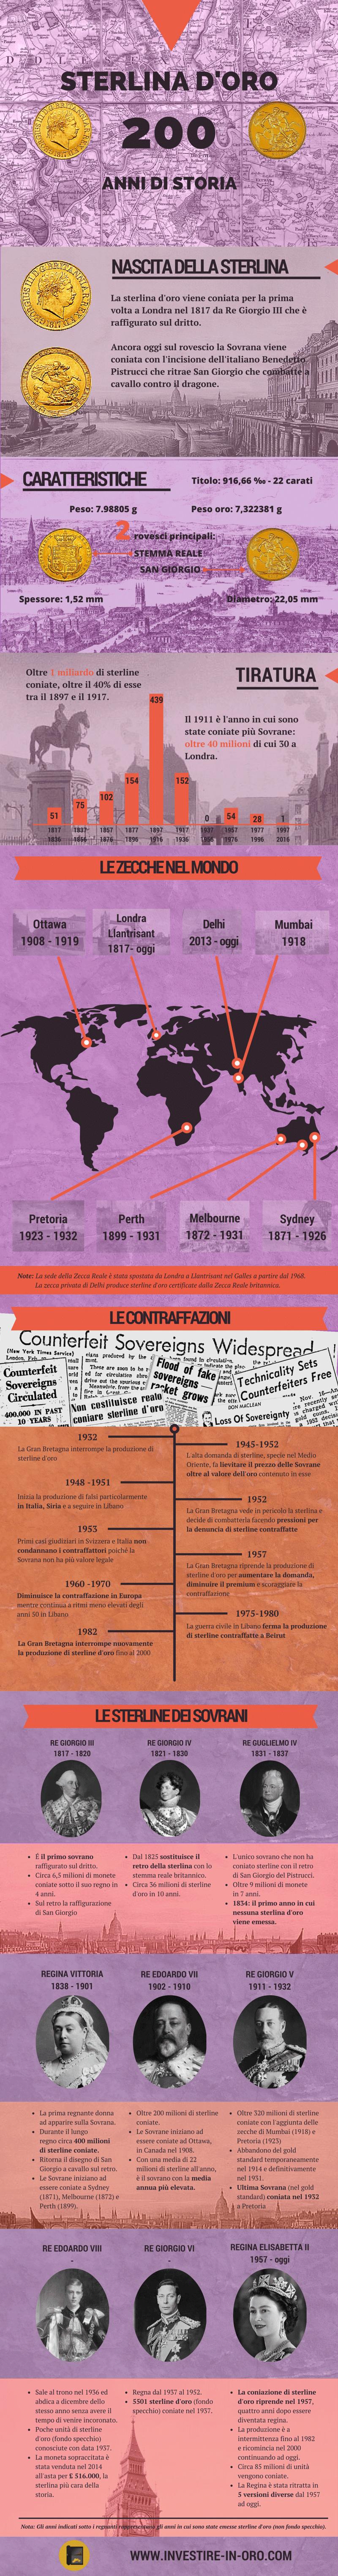 sterlina oro storia infografica